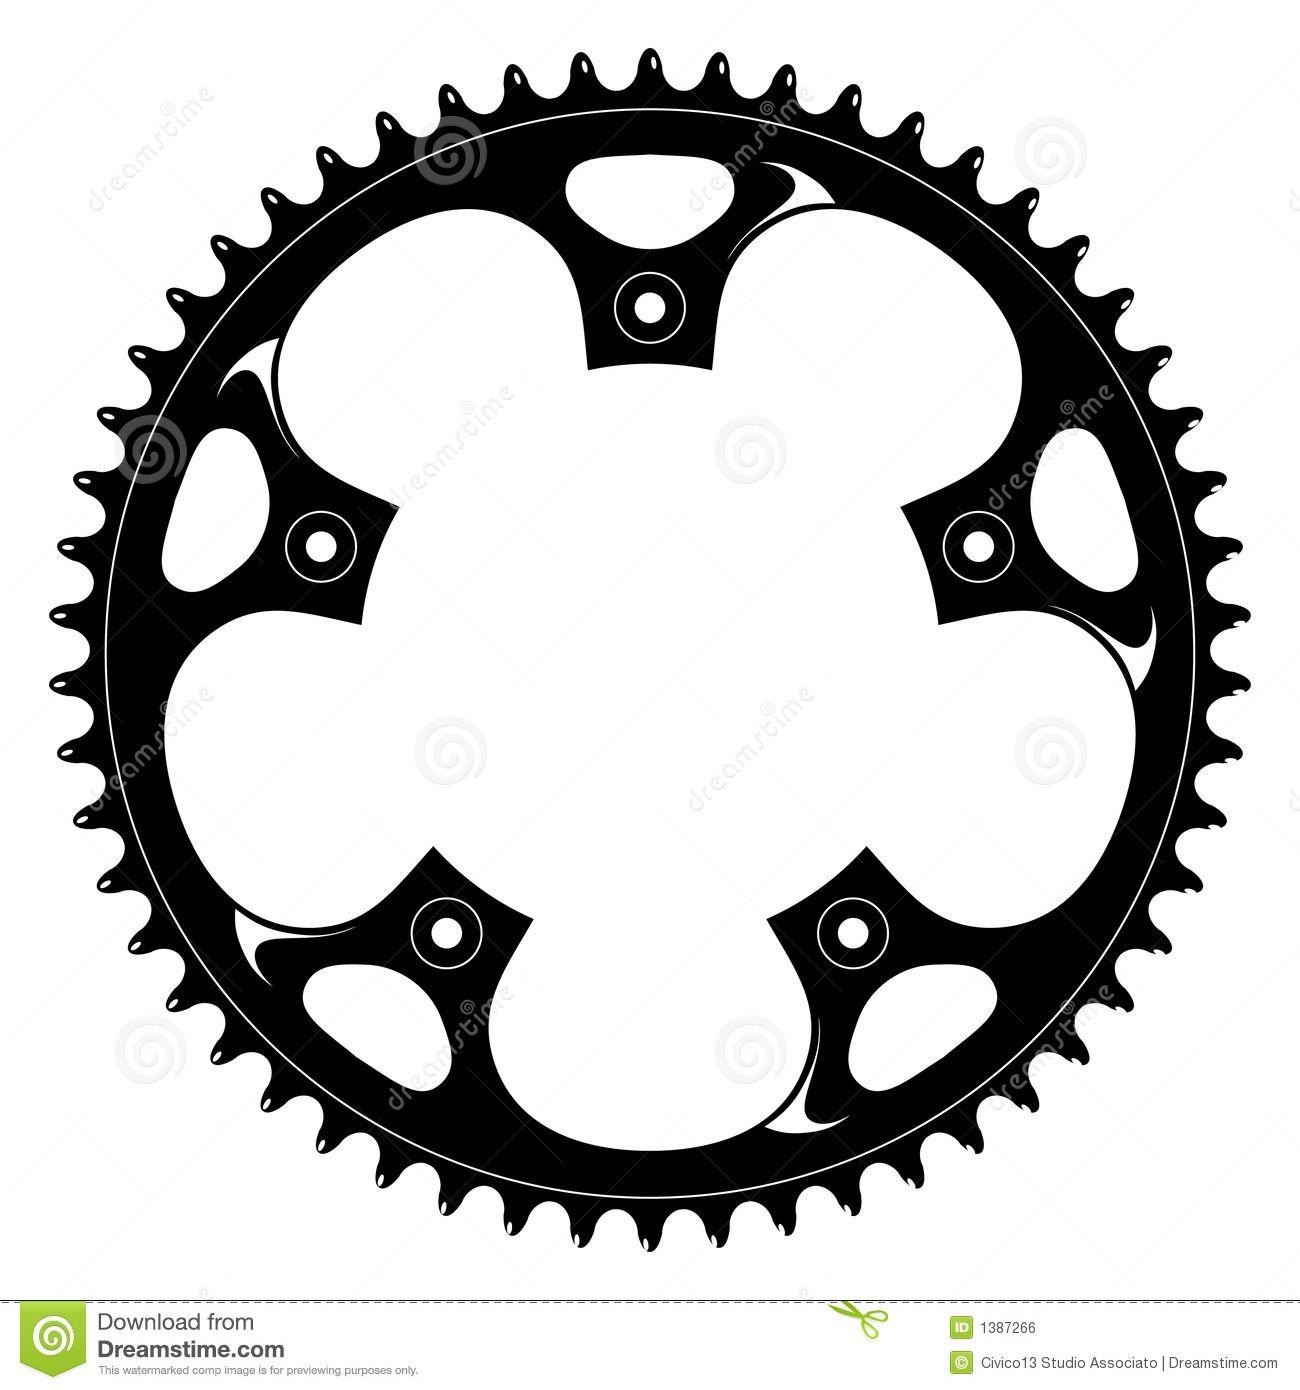 Pin On Bike Art